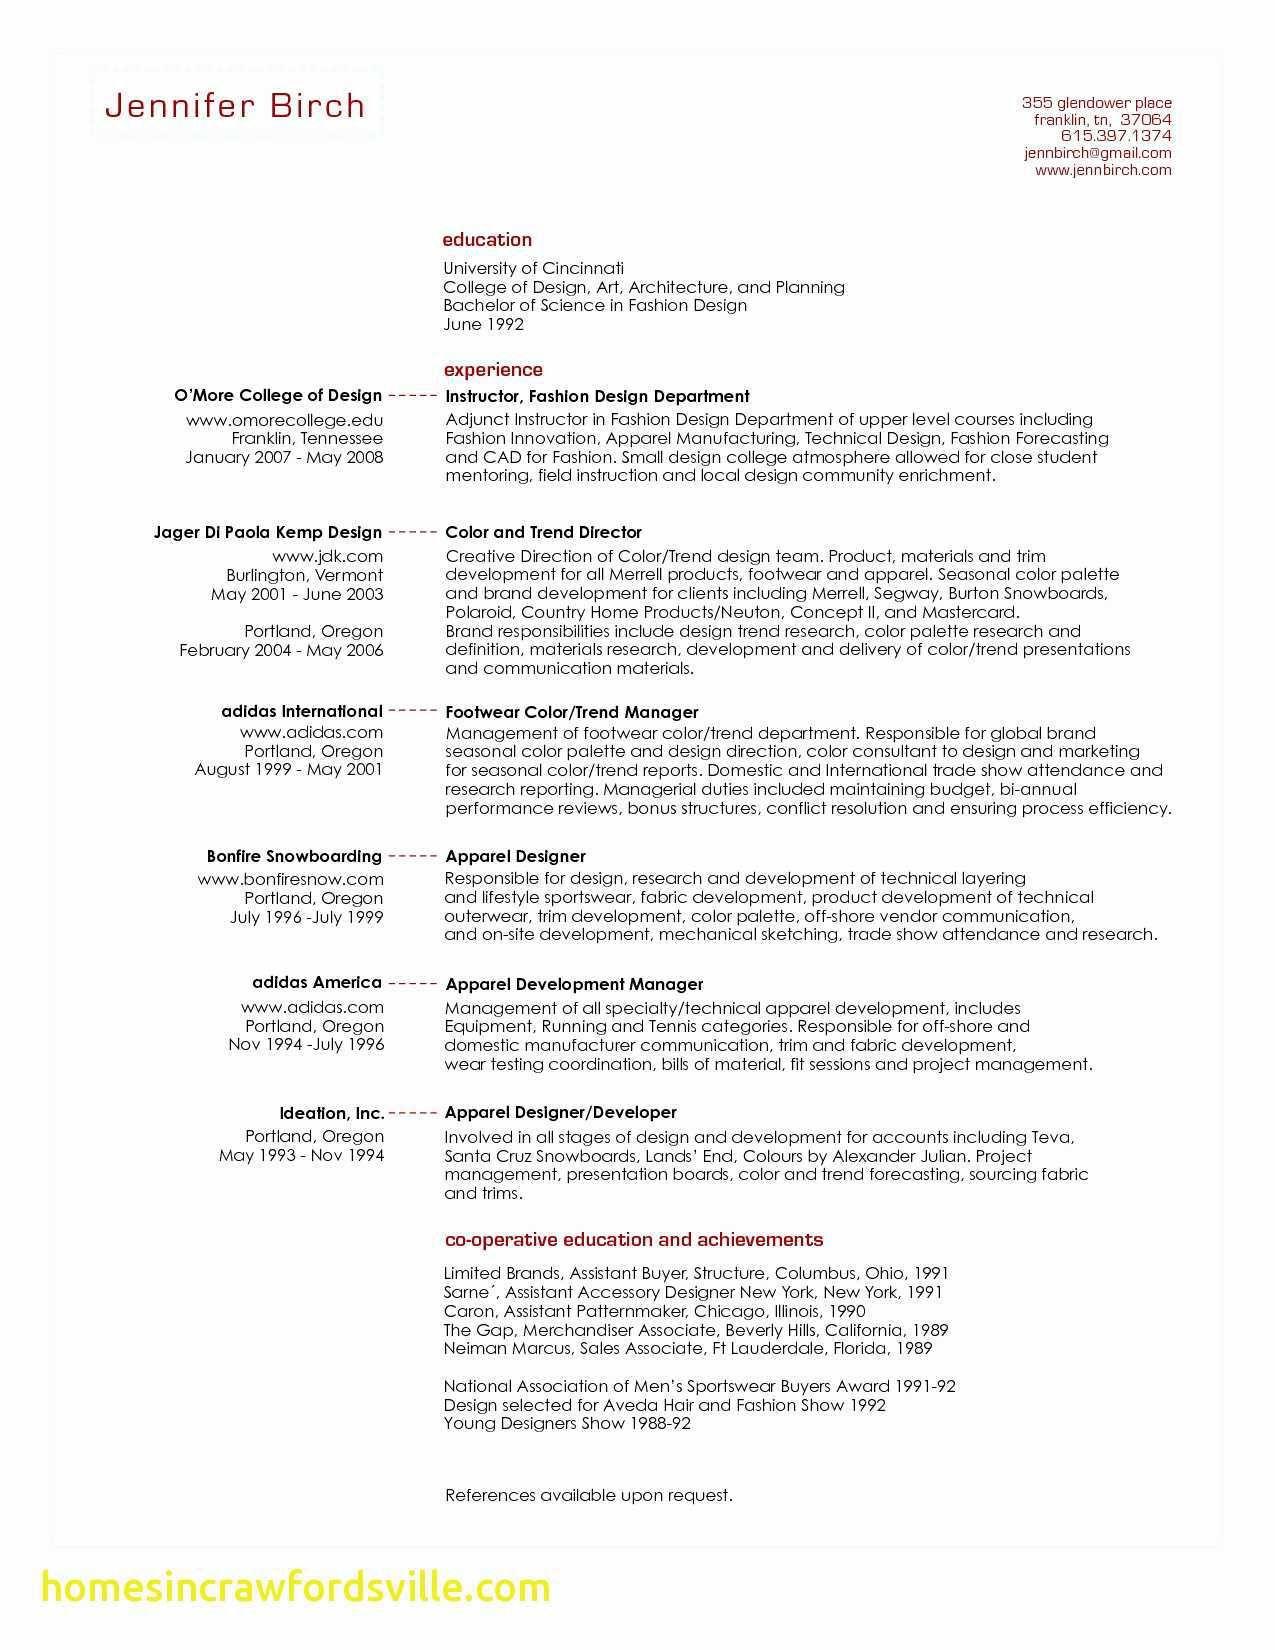 Pin By Mas Sant On Resume Template Pinterest Resume Resume